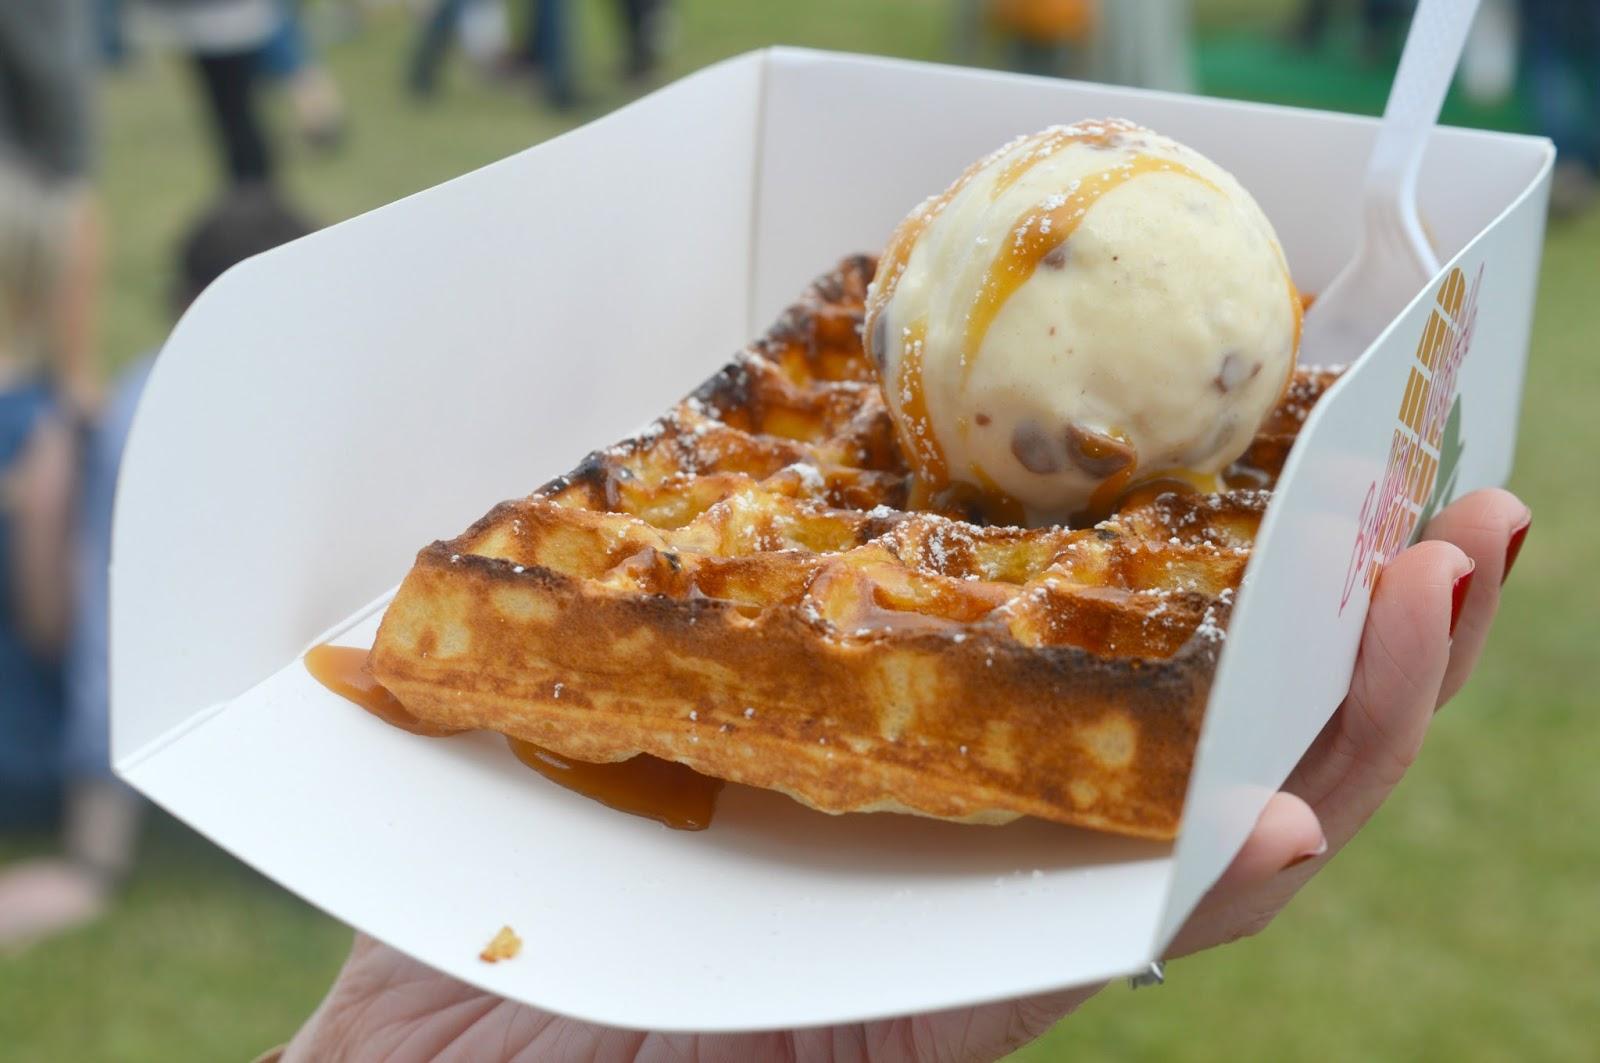 The Foodies Festival - Belgian Waffle Tuk